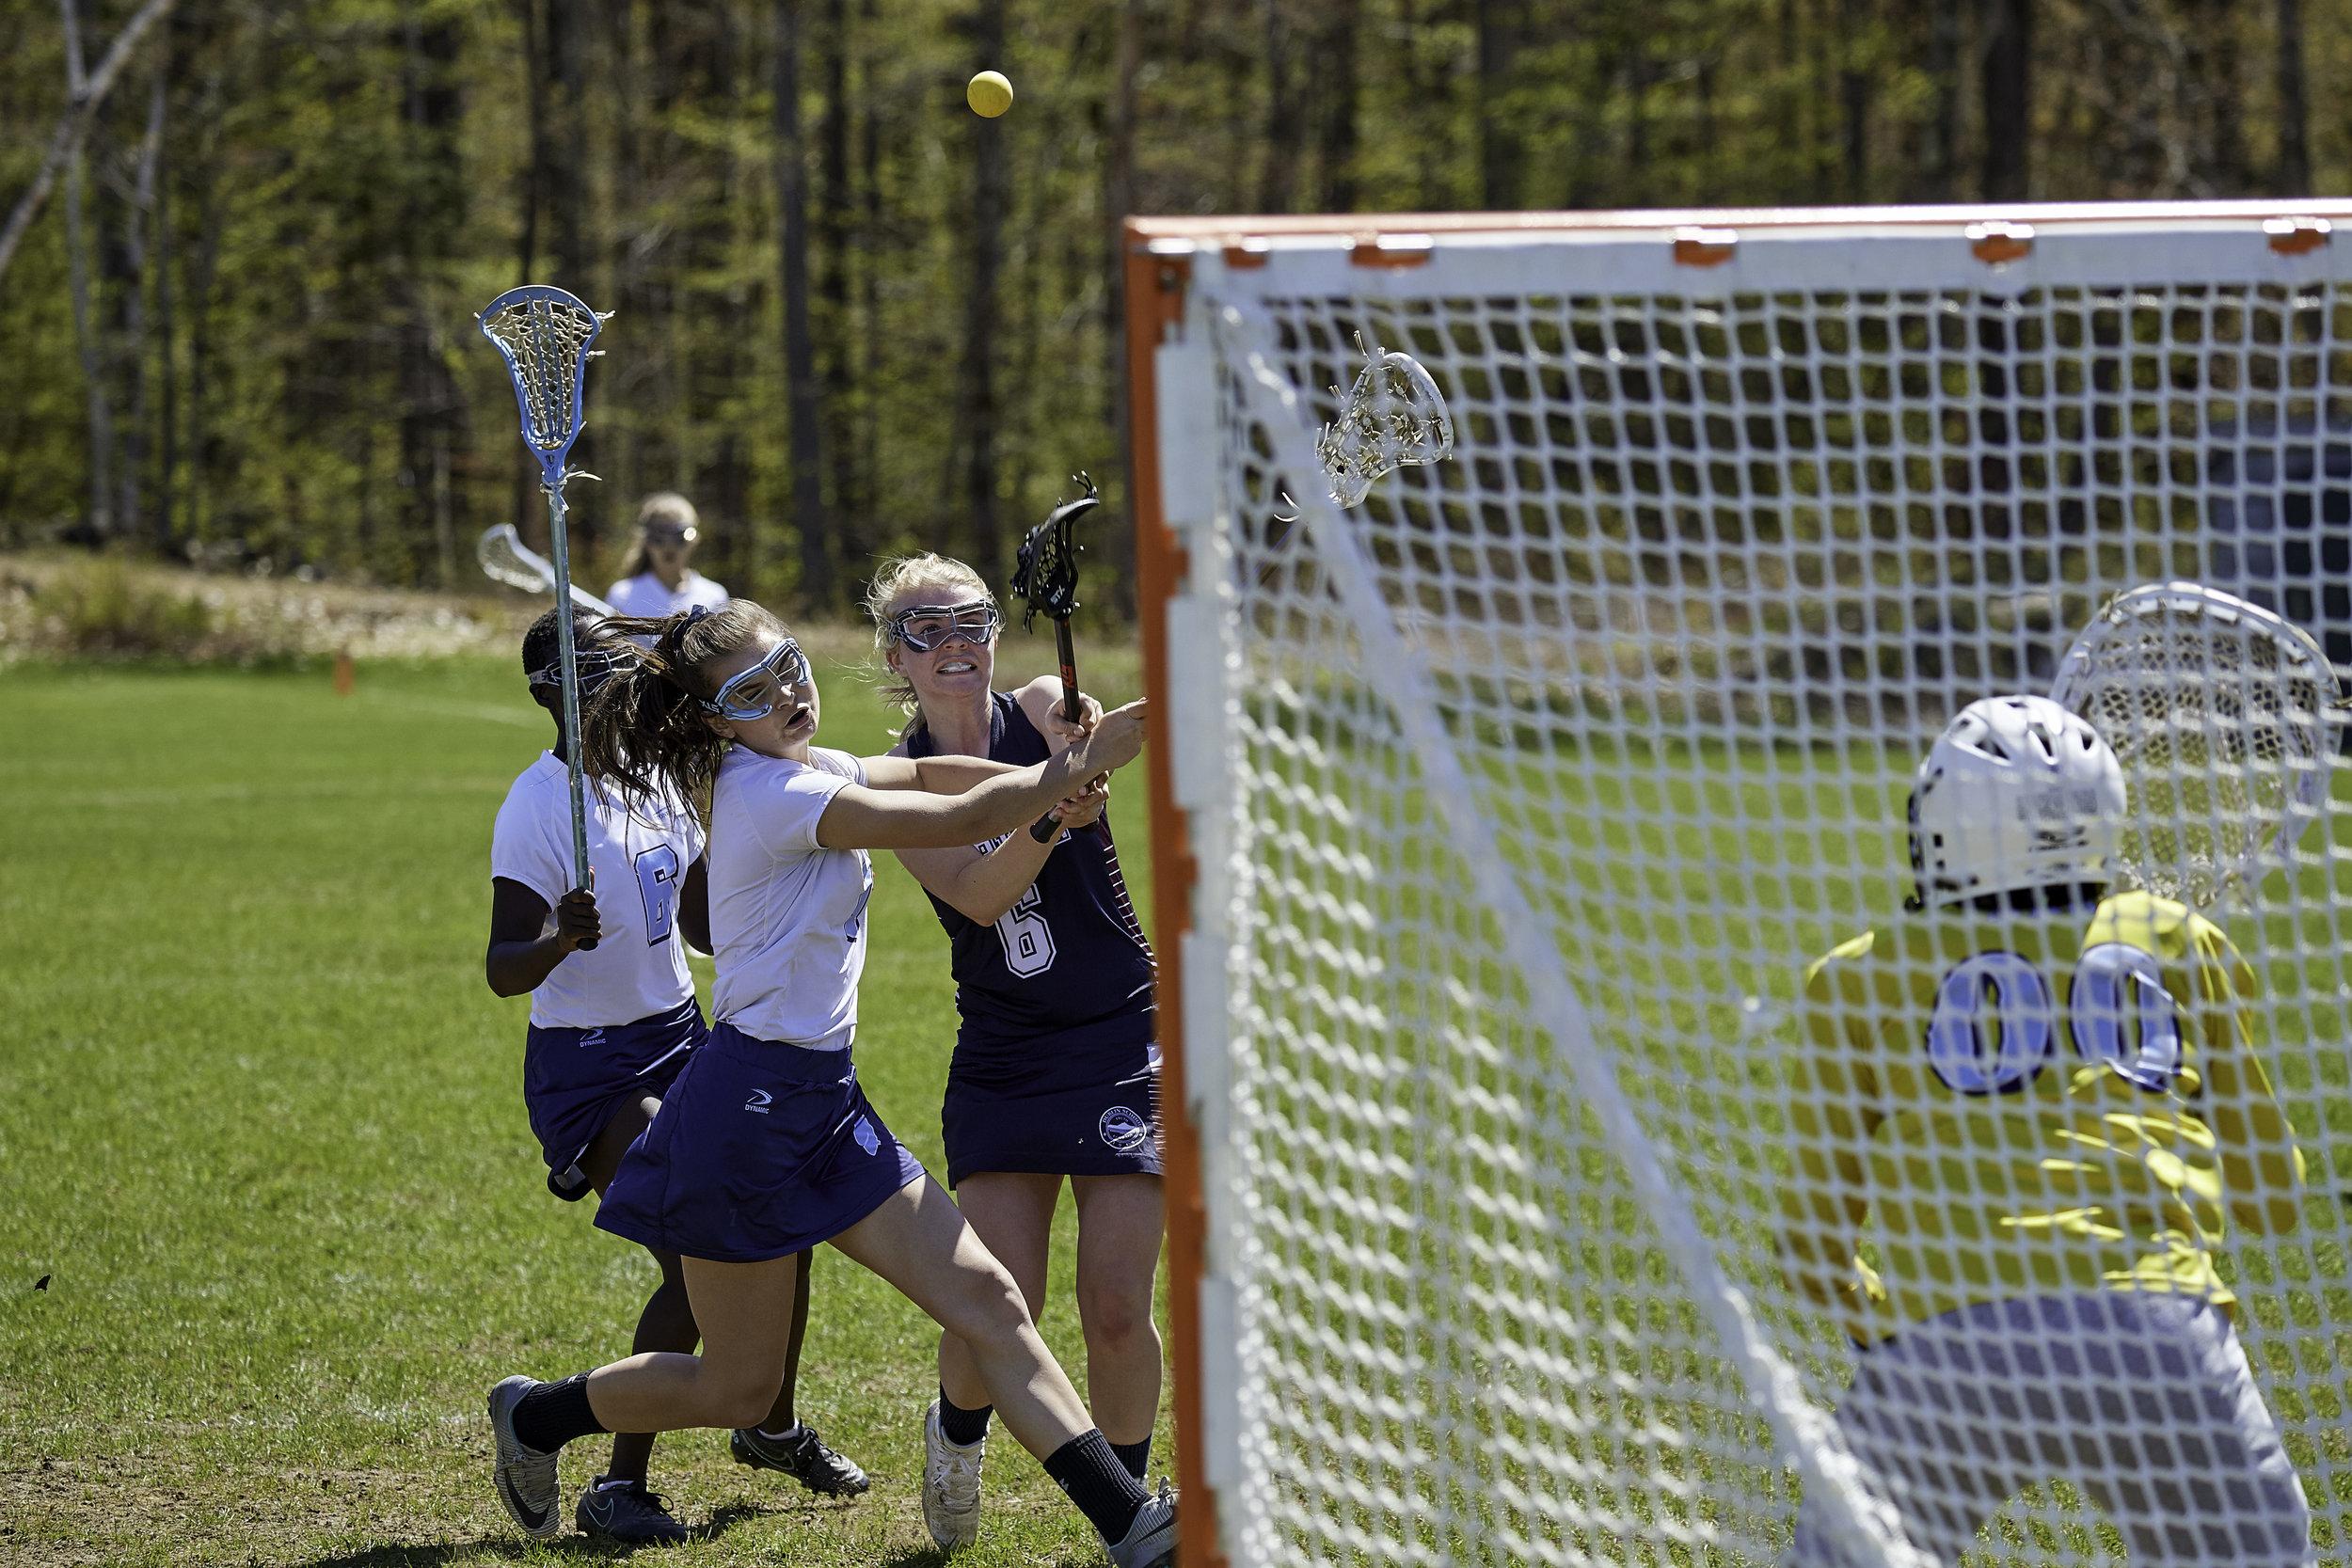 Girls Lacrosse vs. Stoneleigh Burnham School - May 11, 2019 - May 10, 2019193251.jpg